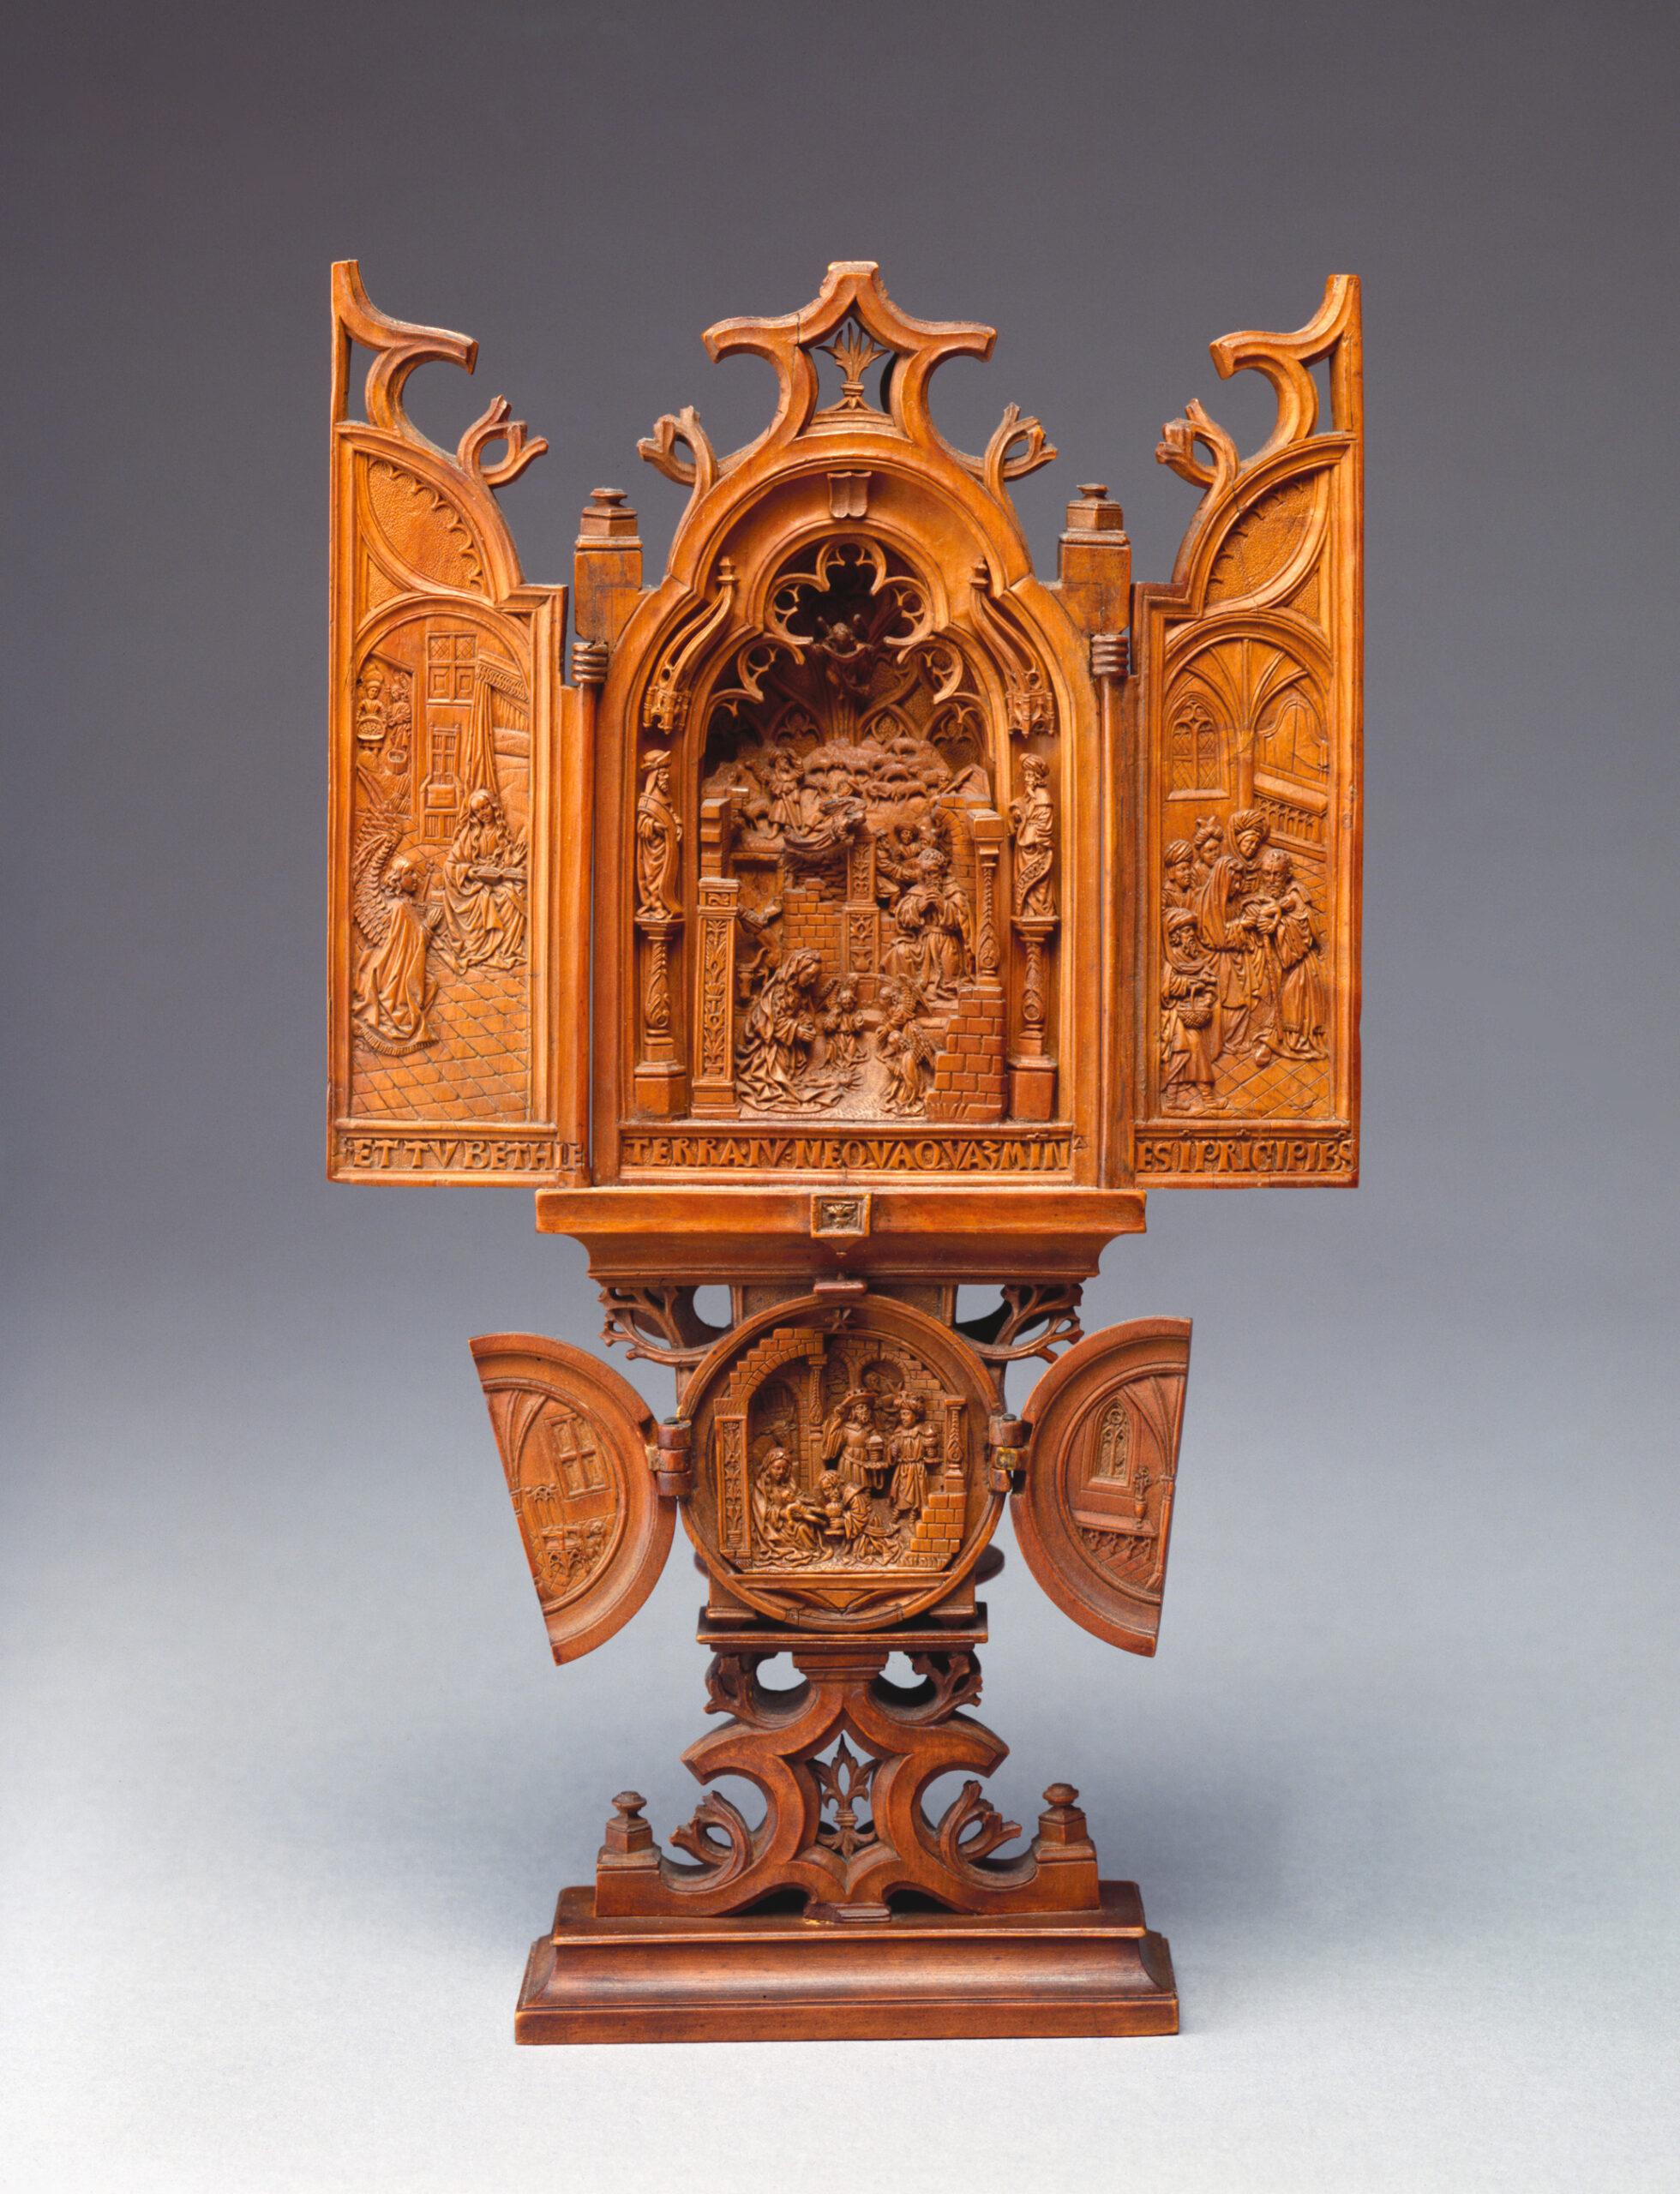 Unidentified artist (Brabant), Triptych, ca. 1520, boxwood, 22.9 x 13.6 cm Detroit Institute of Arts